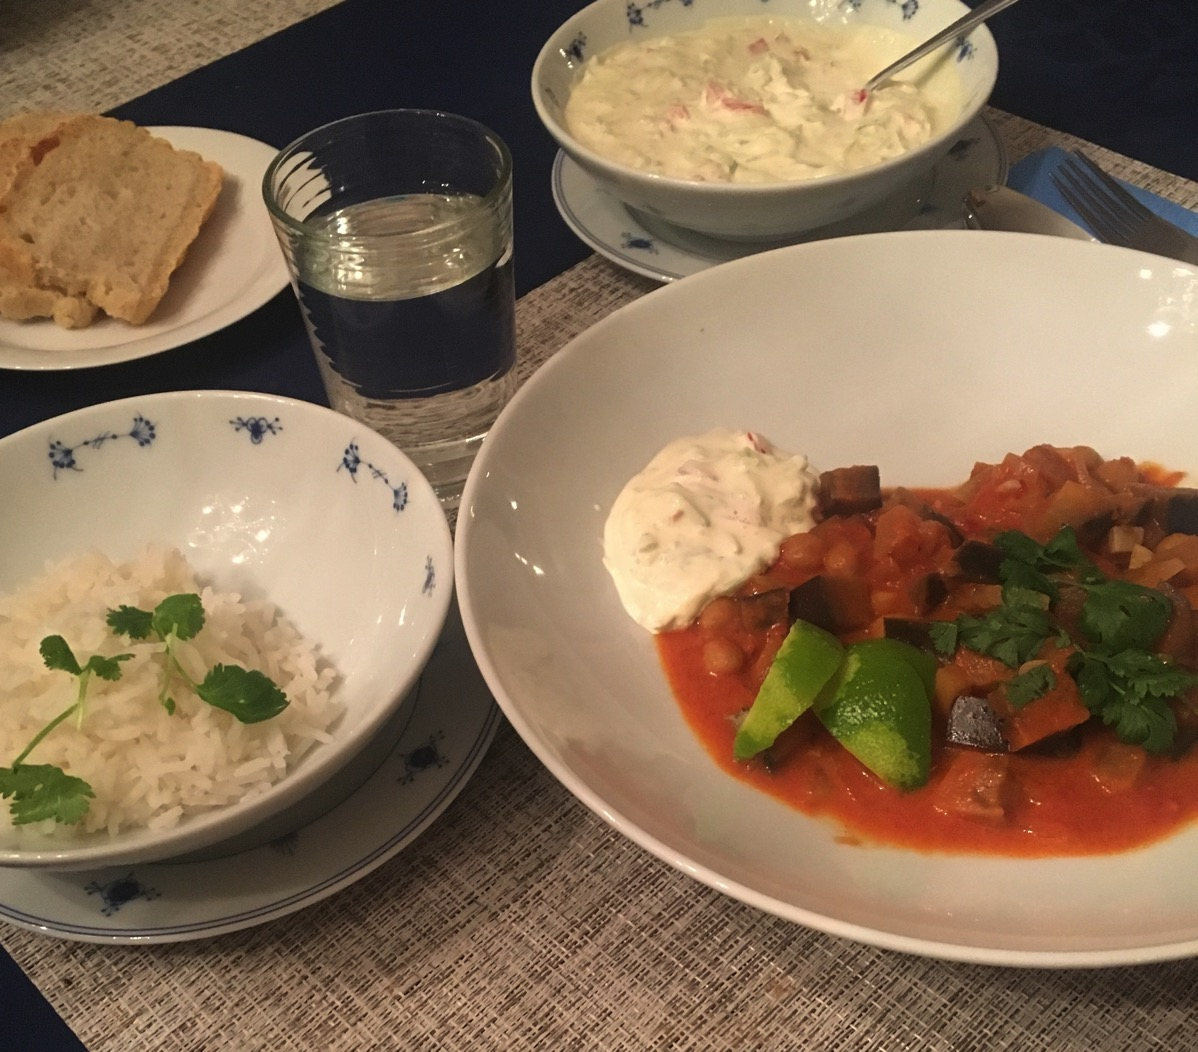 Vegetarcurry med aubergine, kikerter, raita og naan